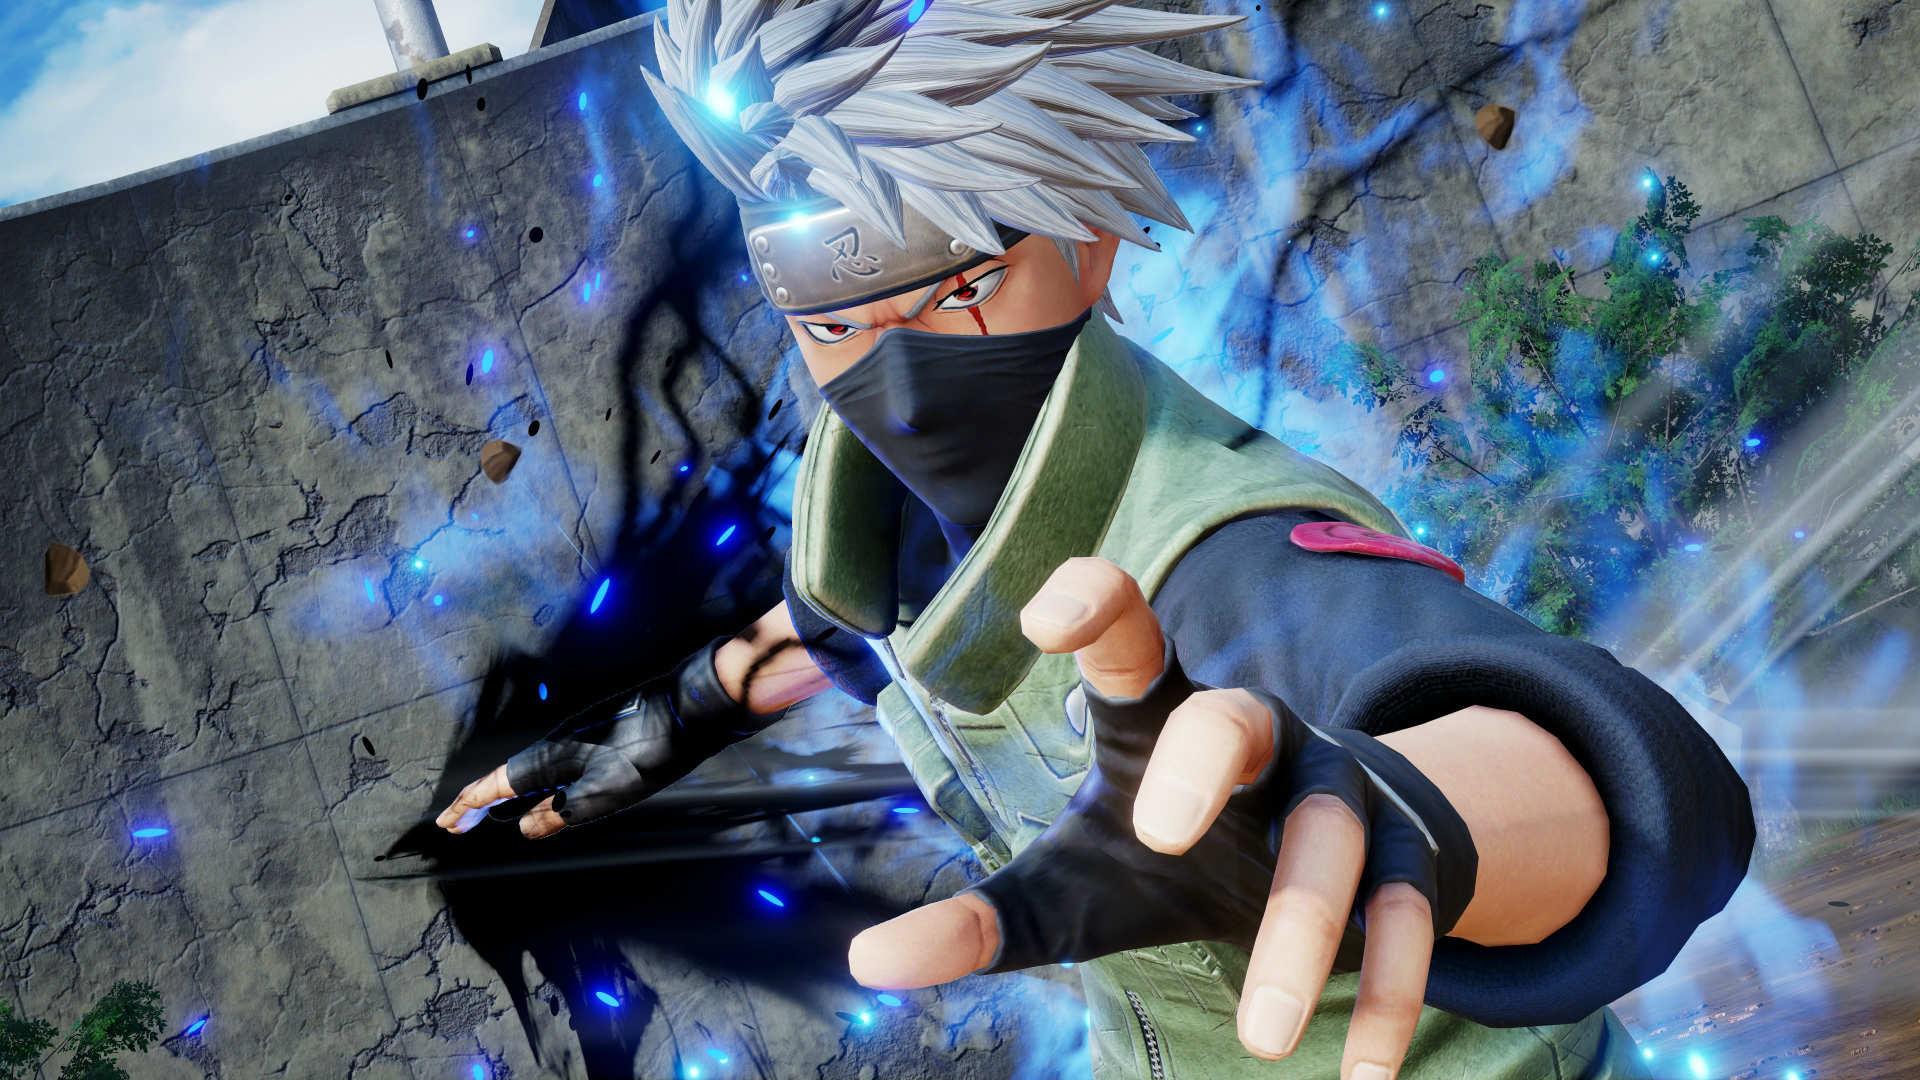 Imagenes De Kakashi Gaara Boruto Y Kaguya En Jump Force Hobbyconsolas Juegos